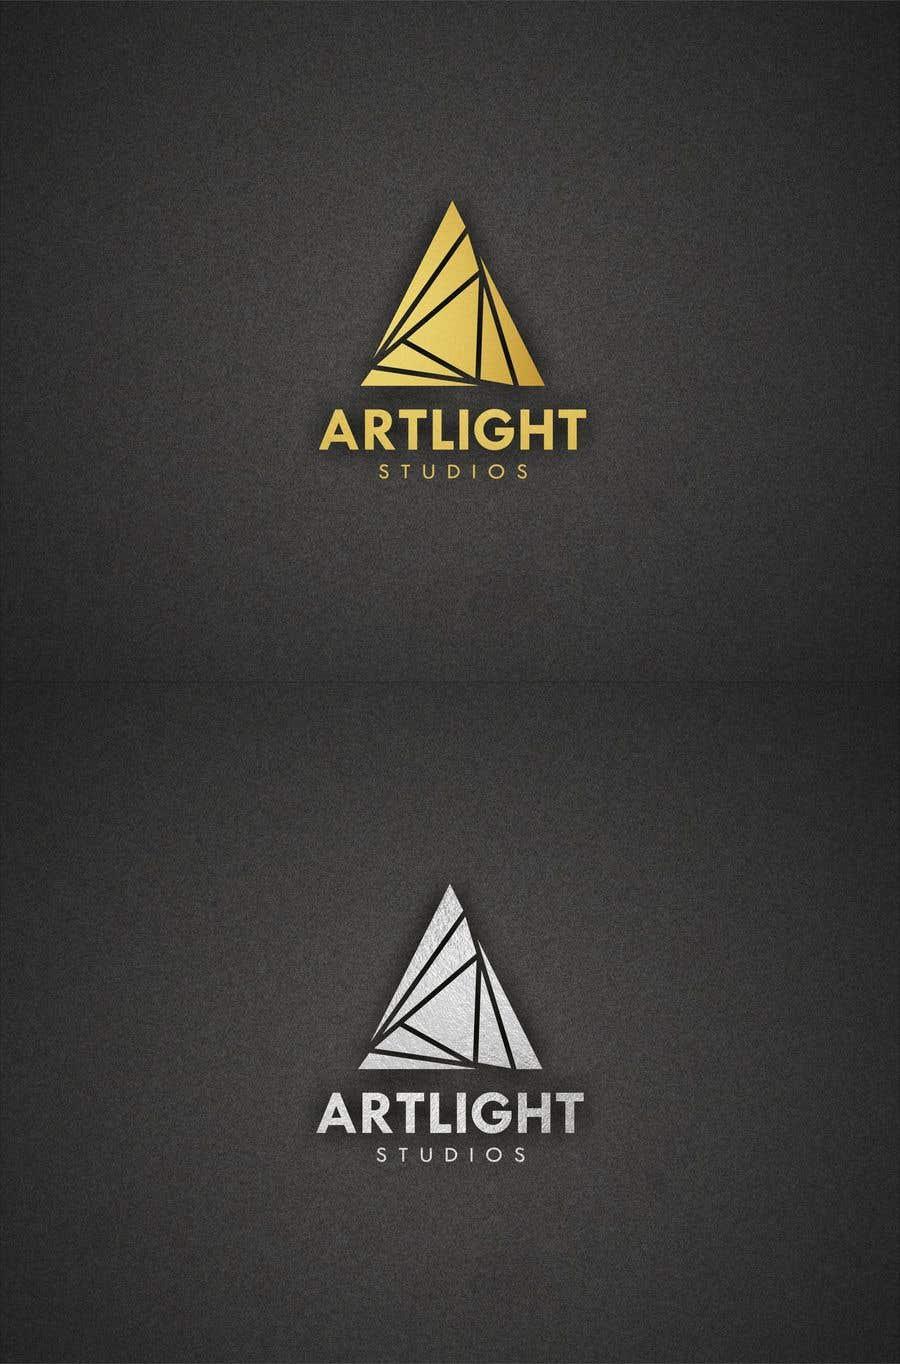 Konkurrenceindlæg #185 for Build me a logo/brand